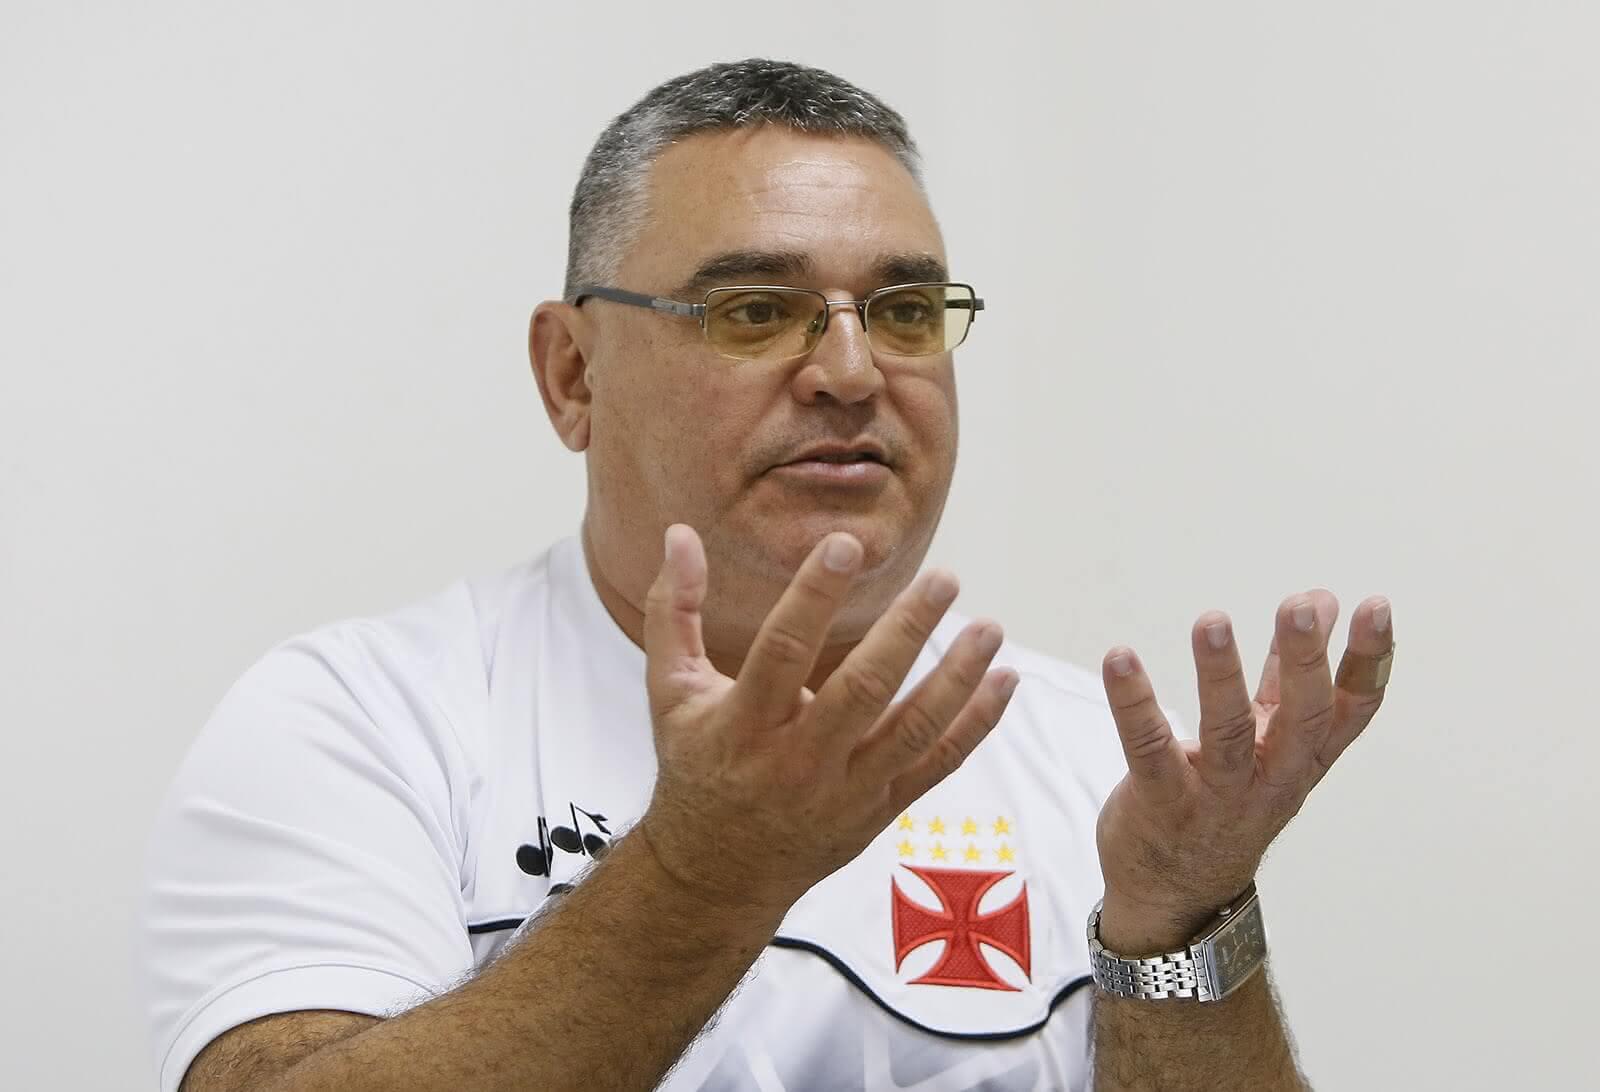 Prospero Paoli, coordenador metodológico da Base do Vasco